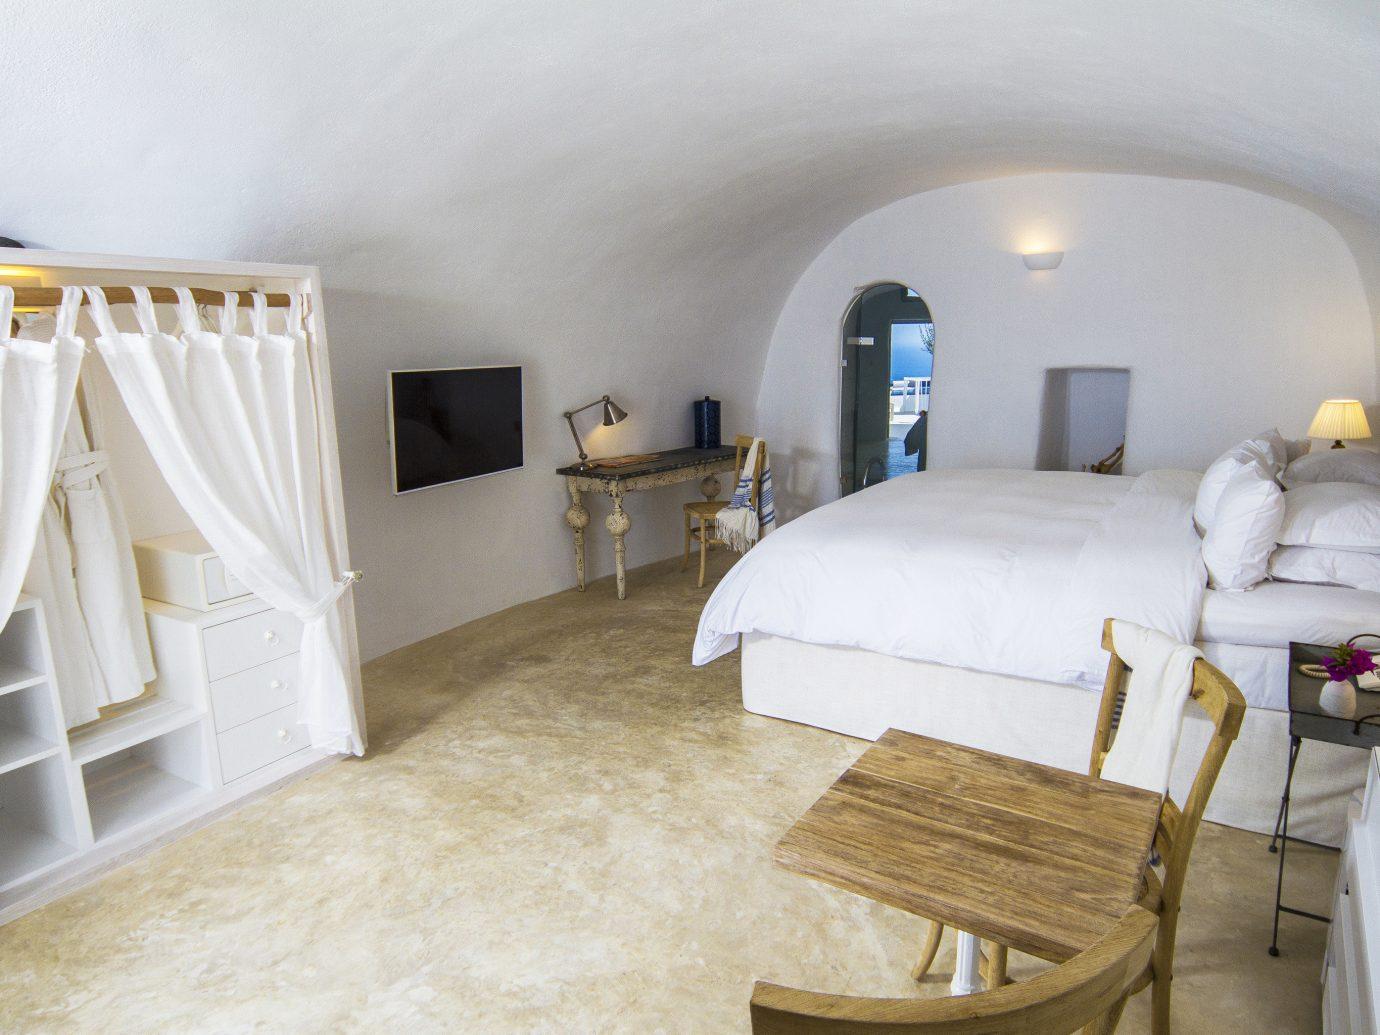 Greece Hotels Santorini indoor wall floor room property Bedroom Suite furniture bed real estate home interior design estate bed frame ceiling product